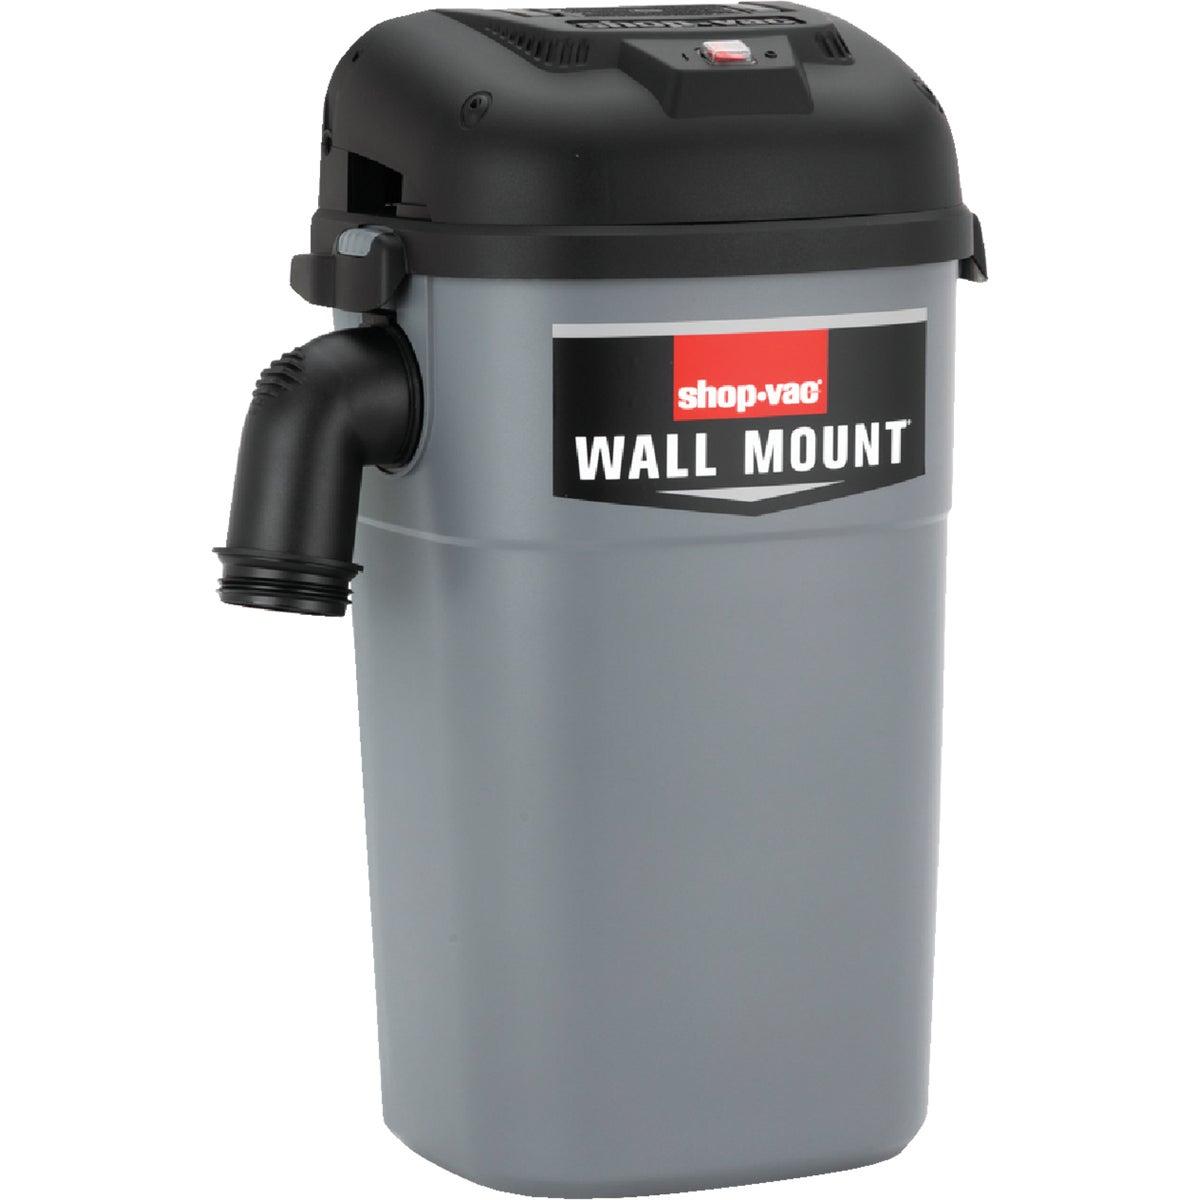 Shop Vac Wall-Mount 5 Gal. Wet/Dry Vacuum, 3941000